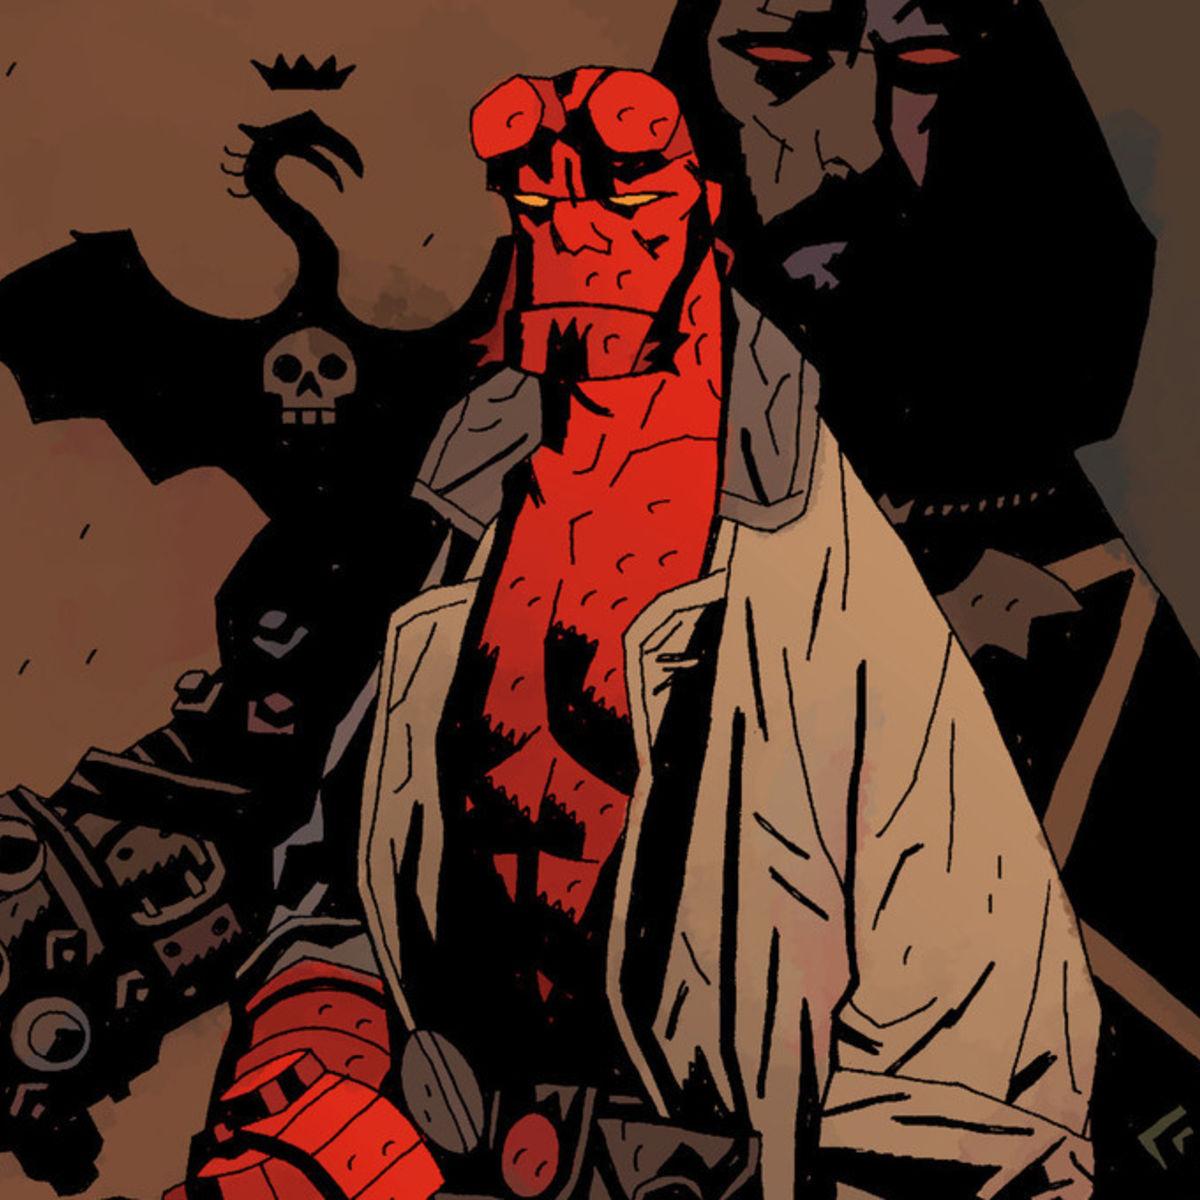 Hellboy Seed of Destruction